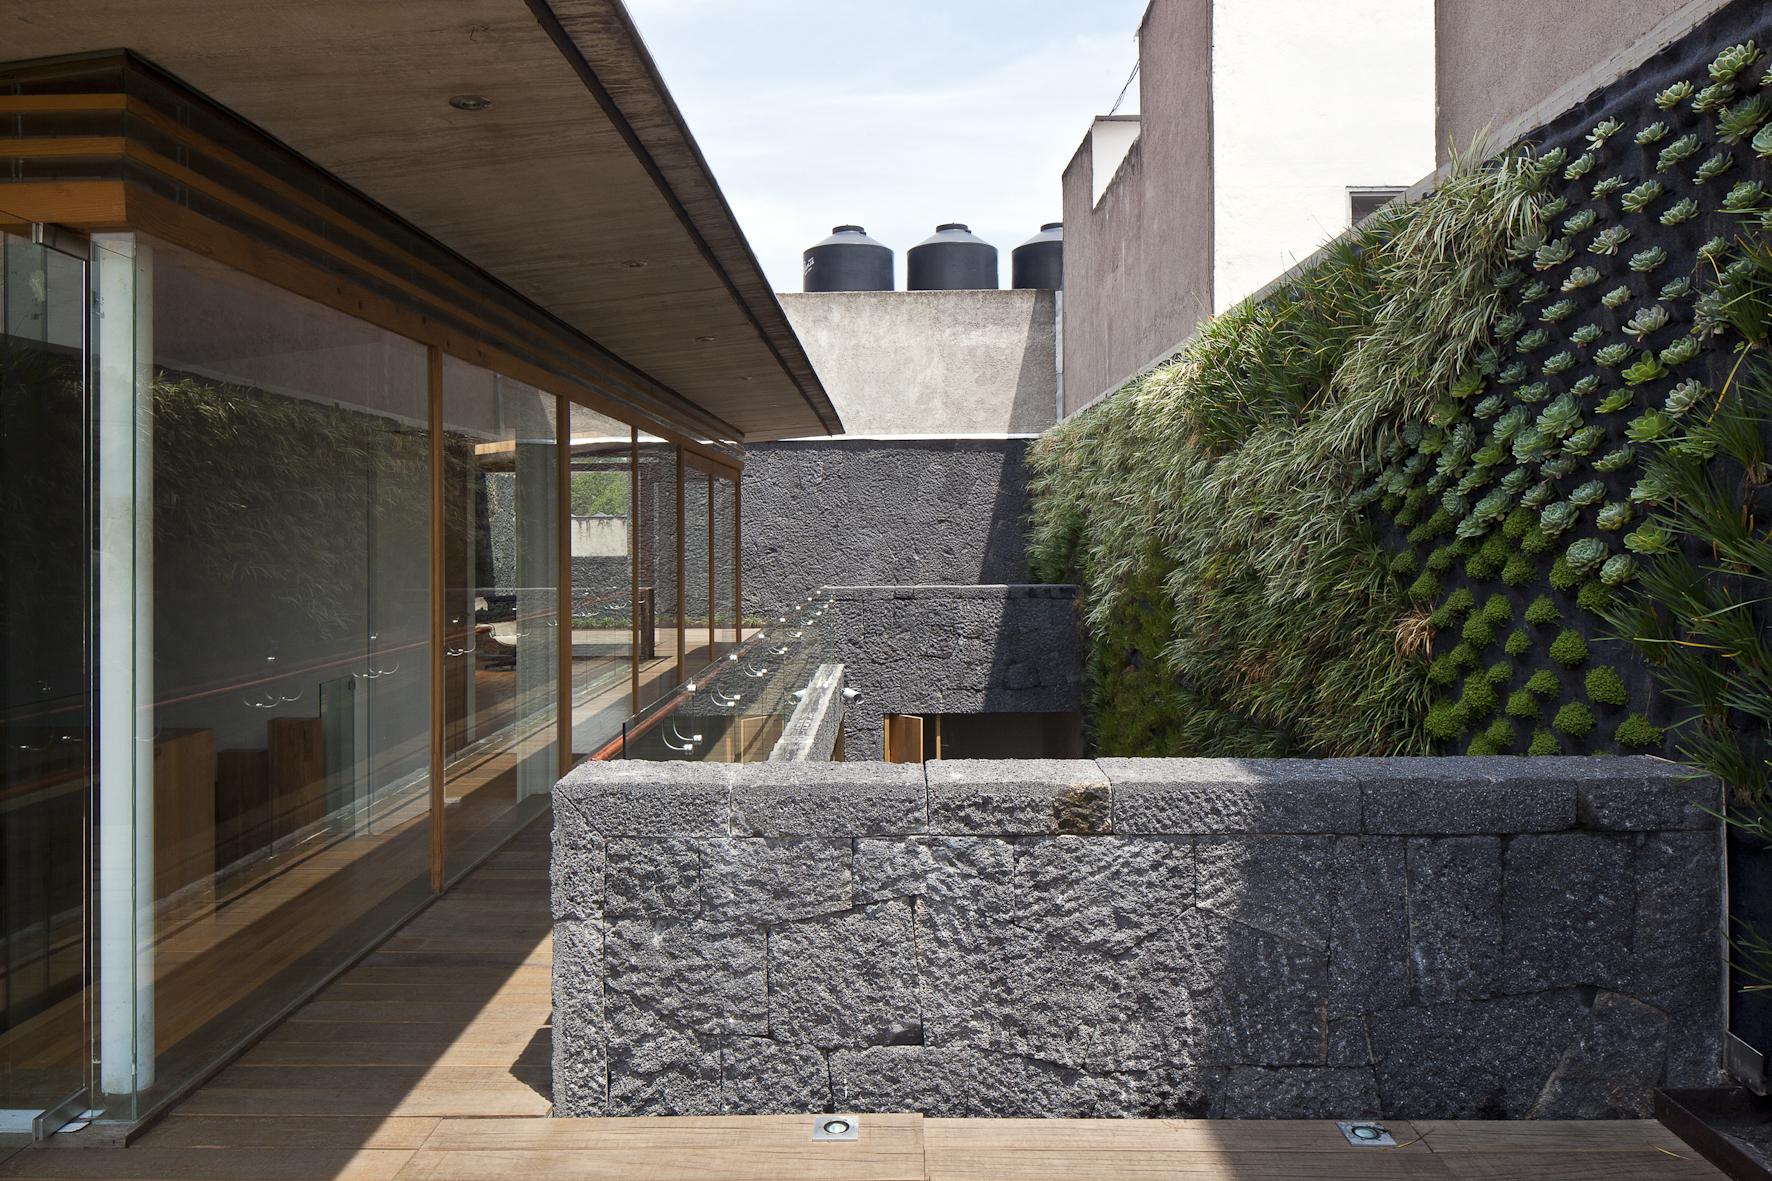 Zamora 63 / TAE Arquitectos, © Onnis Luque